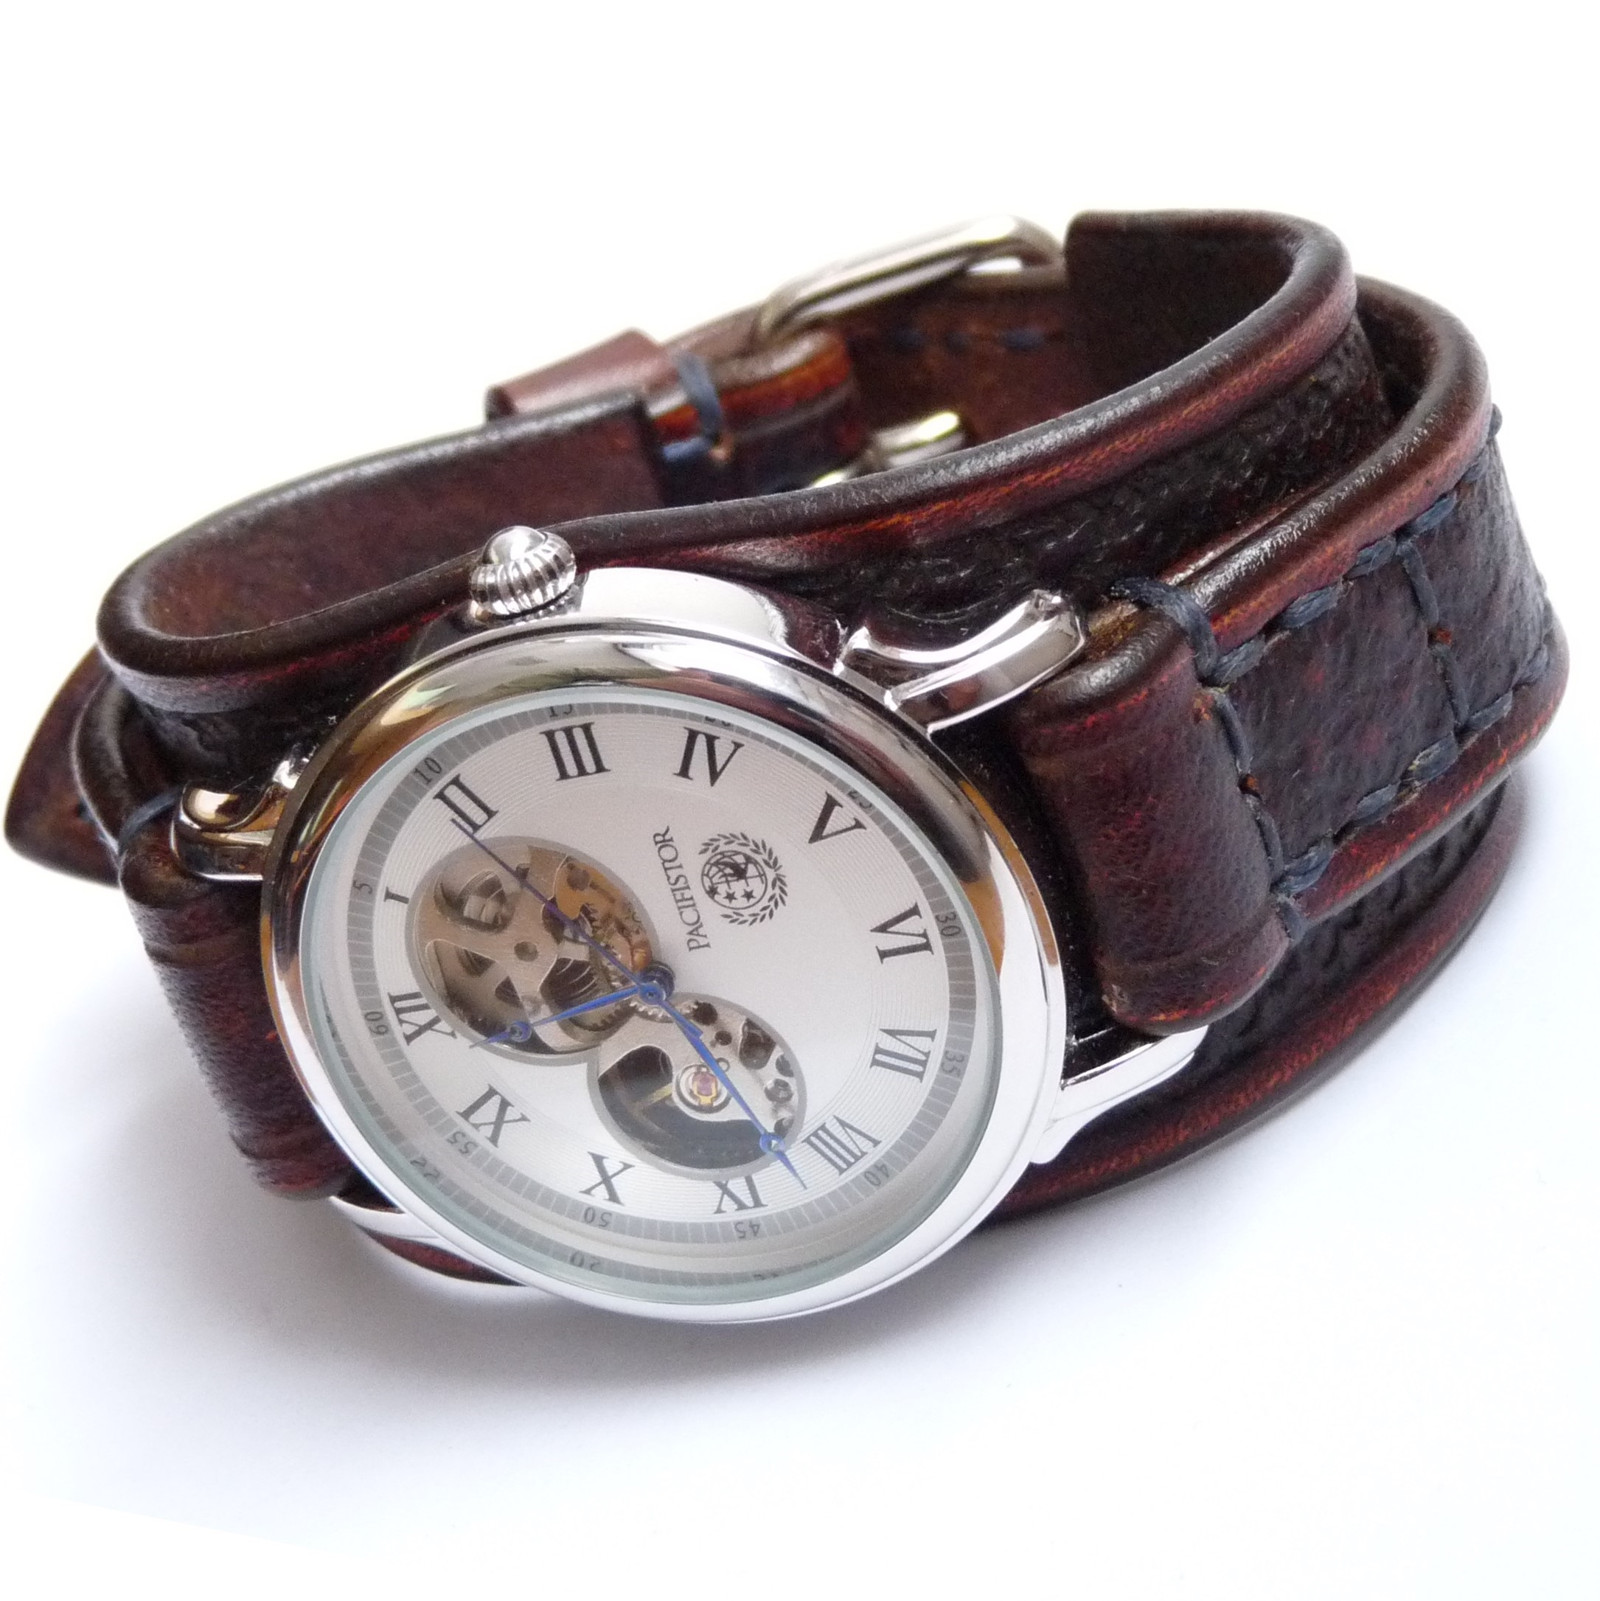 Hnědé pánské hodinky e4615c9e3e